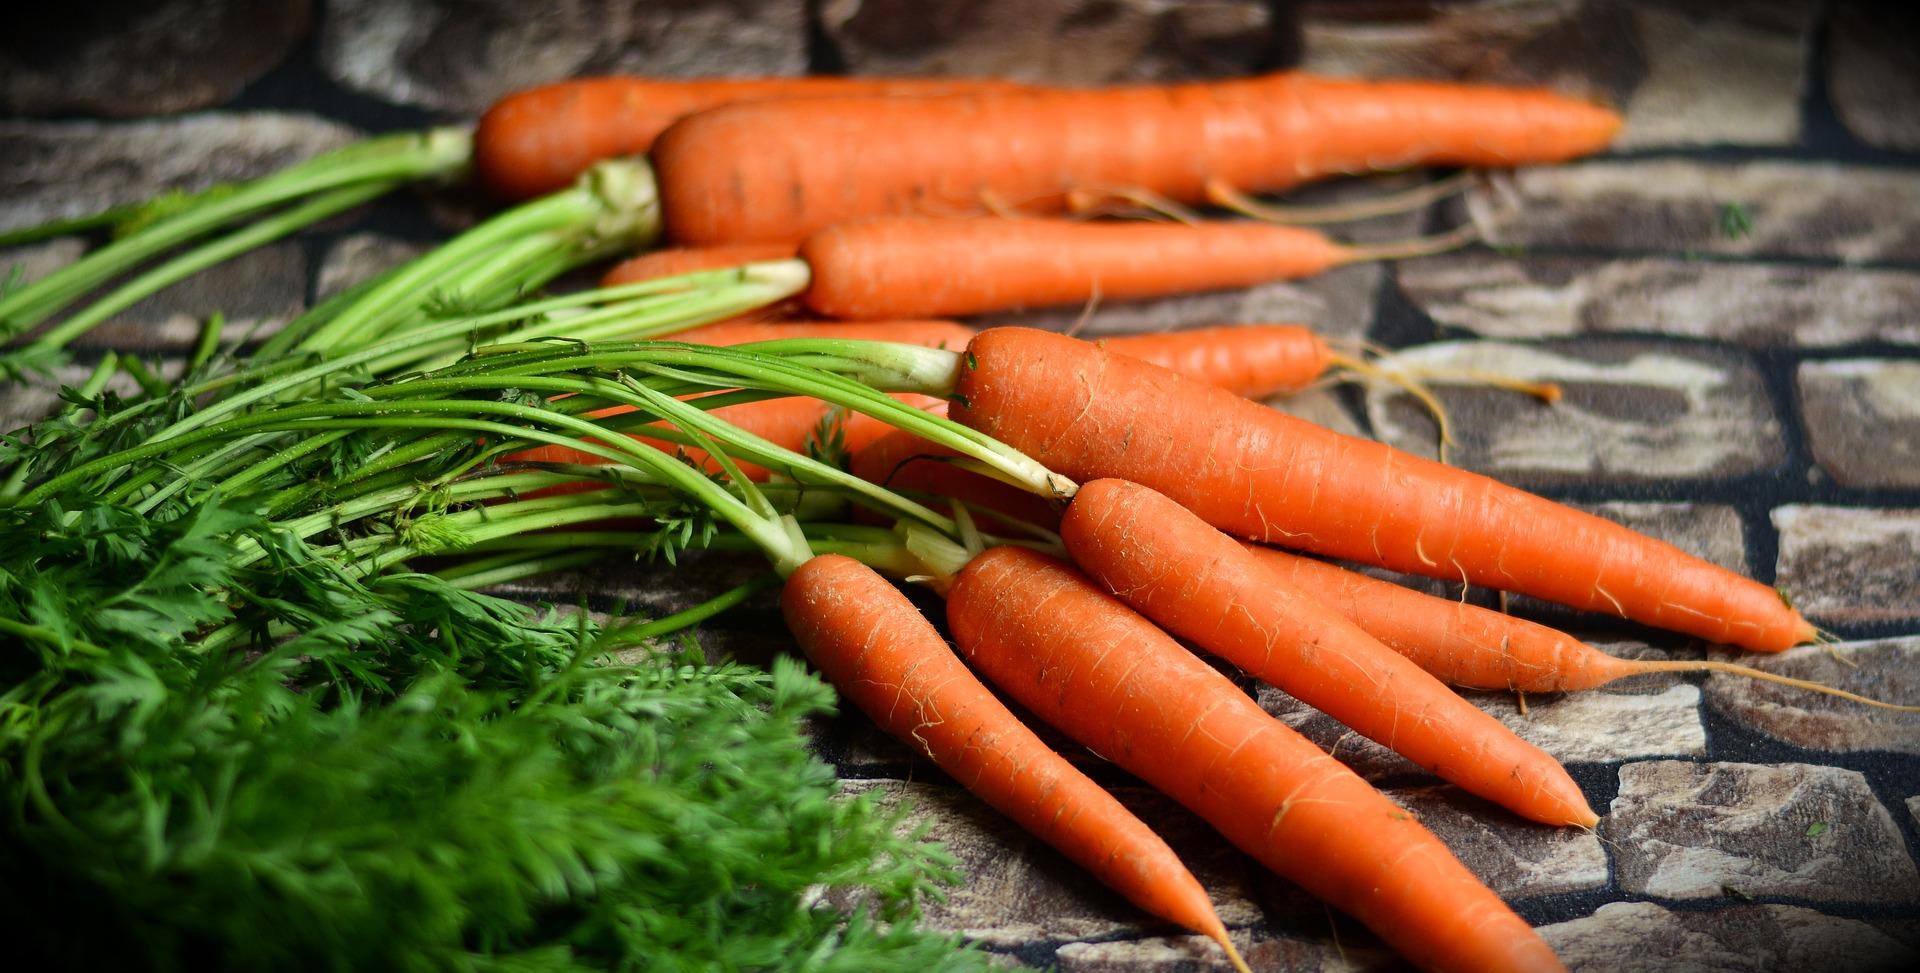 Carrots contain cellulosic nano platelets